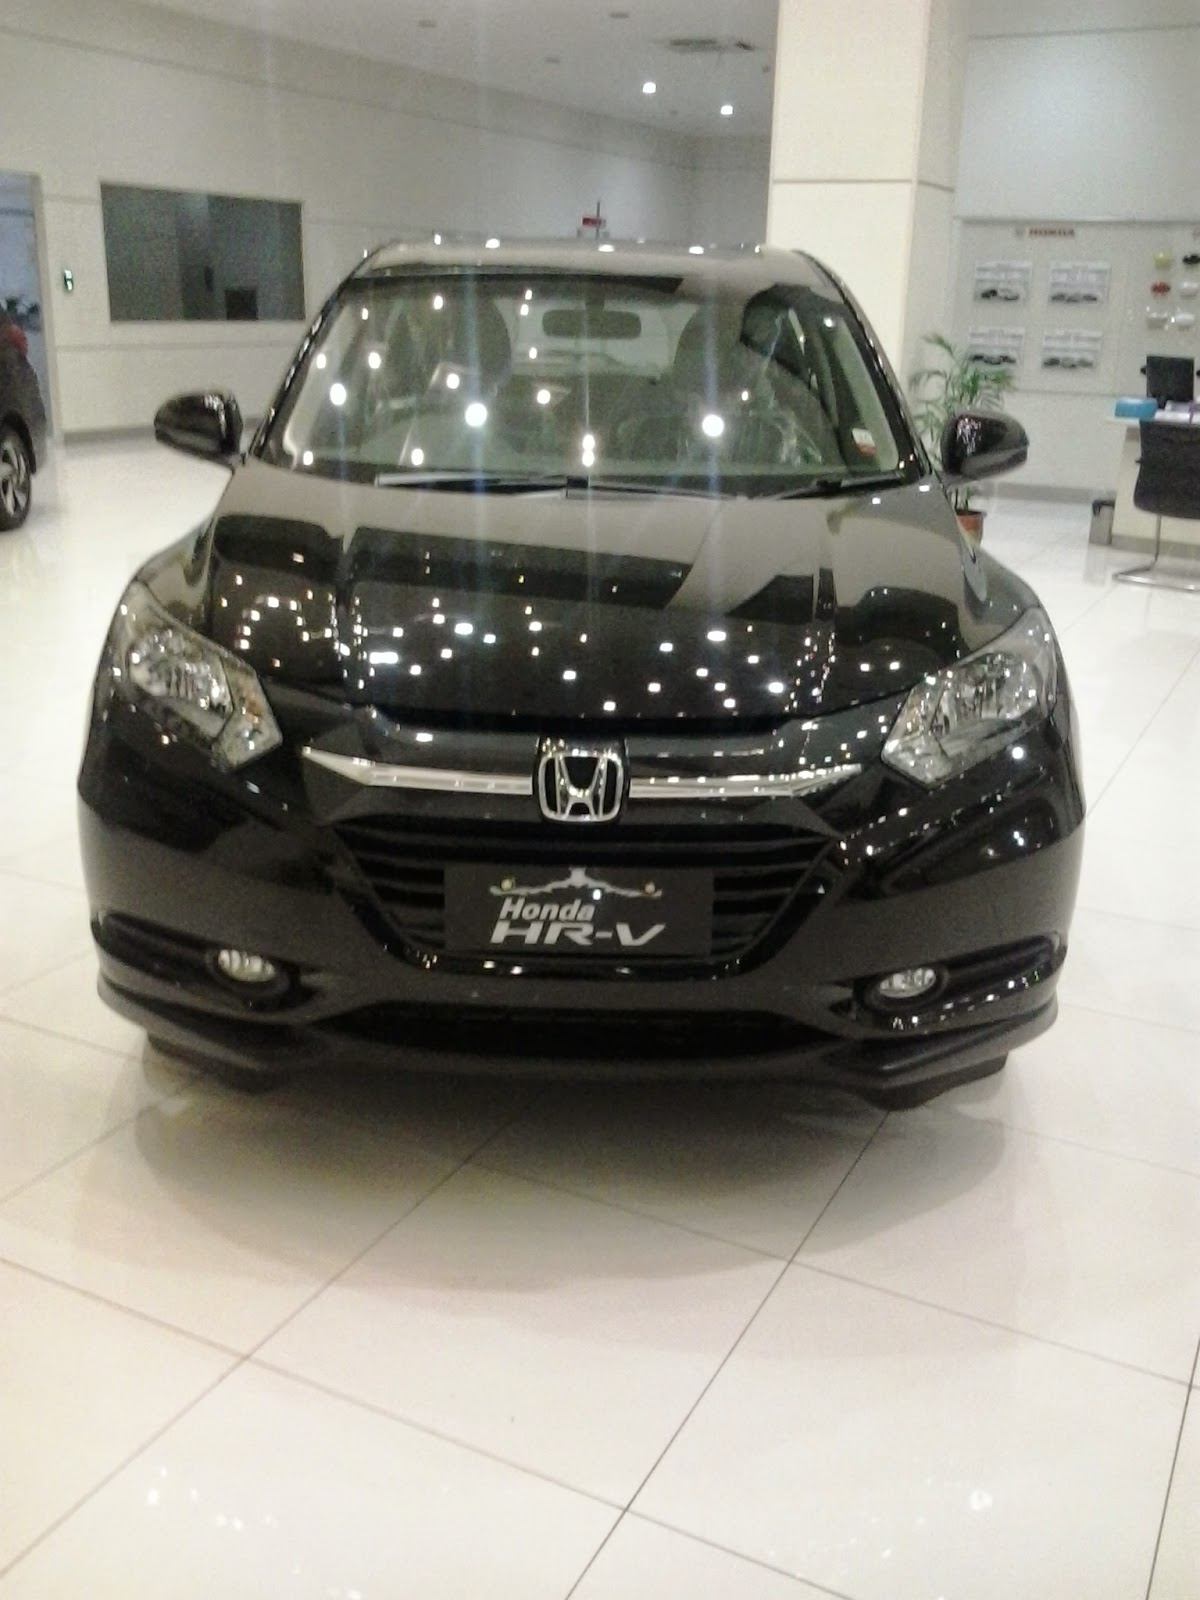 Honda HRV sejak kehadirannya telah menguasai pangsa pasar penjualan mobil di kelas L suv